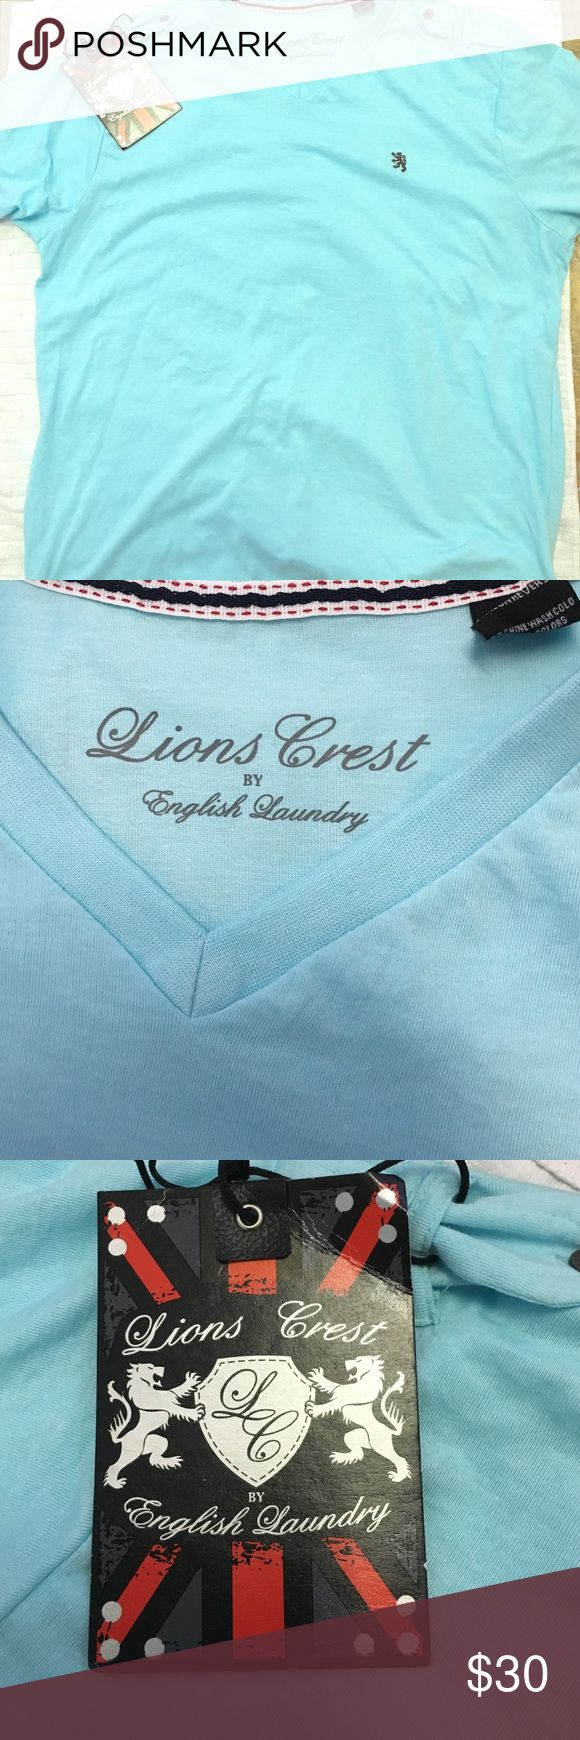 Lions crest light blue shirt NWT light blue v neck shirt English Laundry Shirts Tees - Short Sleeve